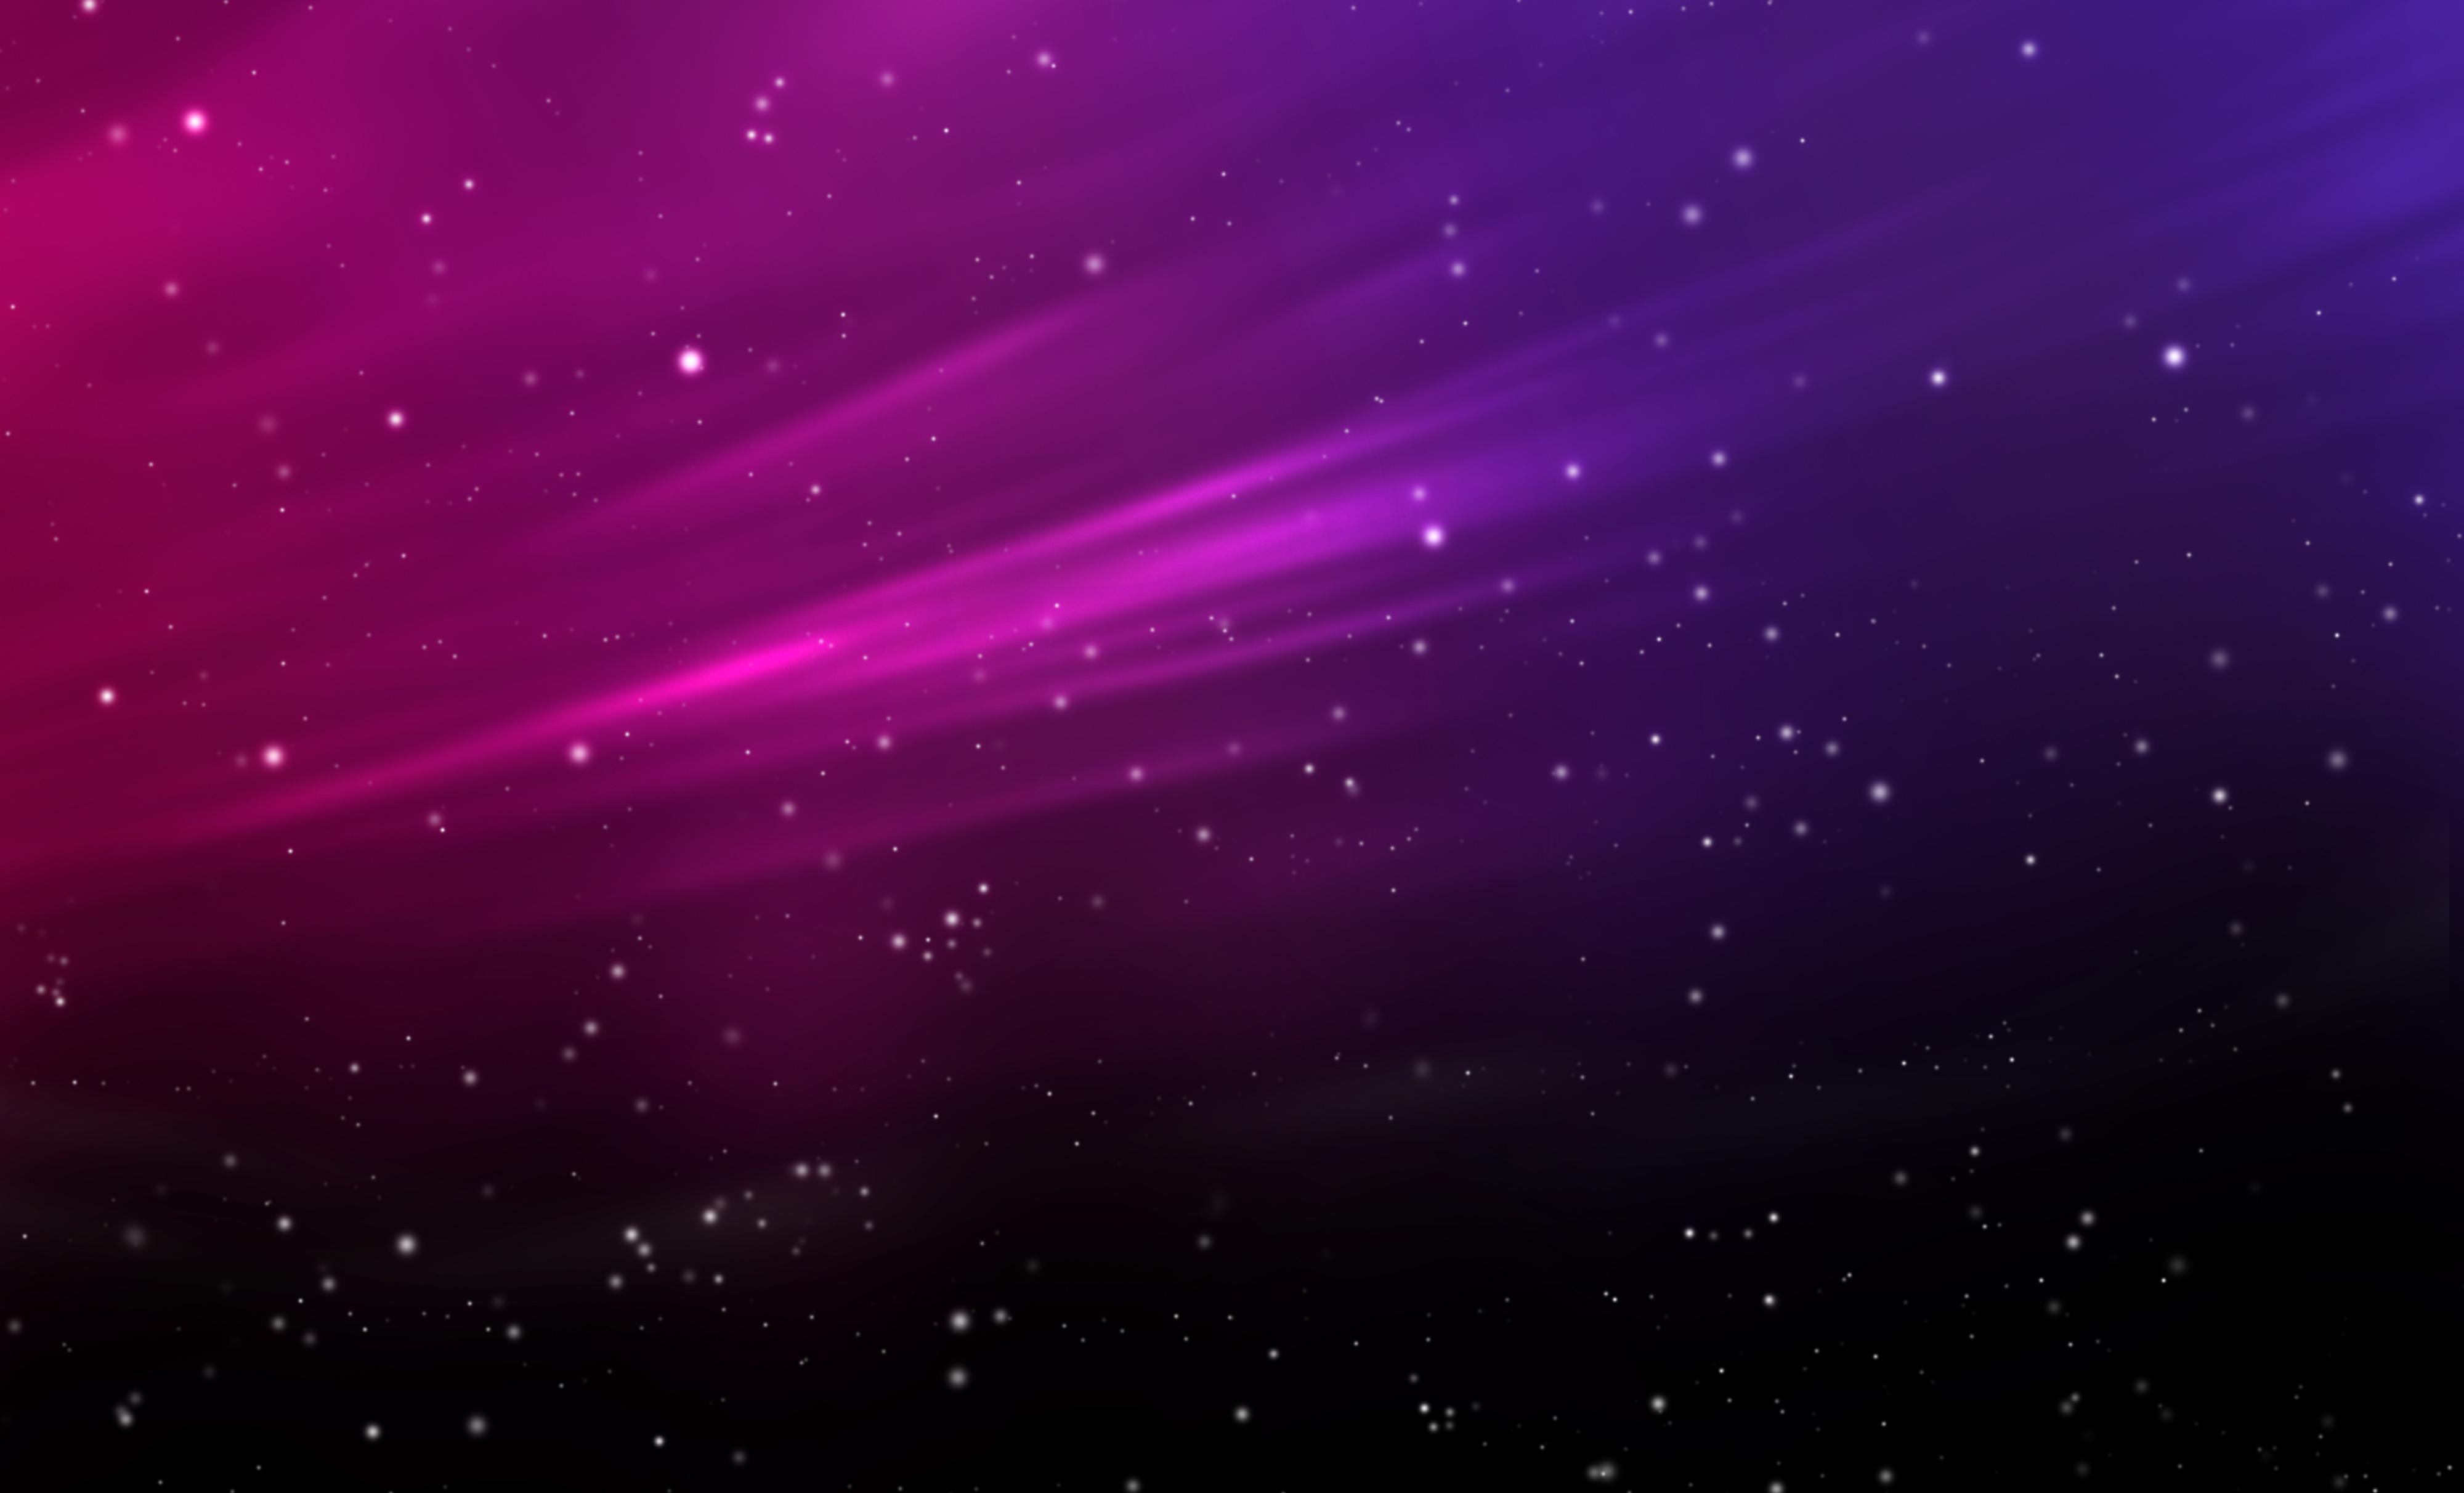 Purple Wallpaper Background PC 7074 Wallpaper Cool Walldiskpaper 4000x2423